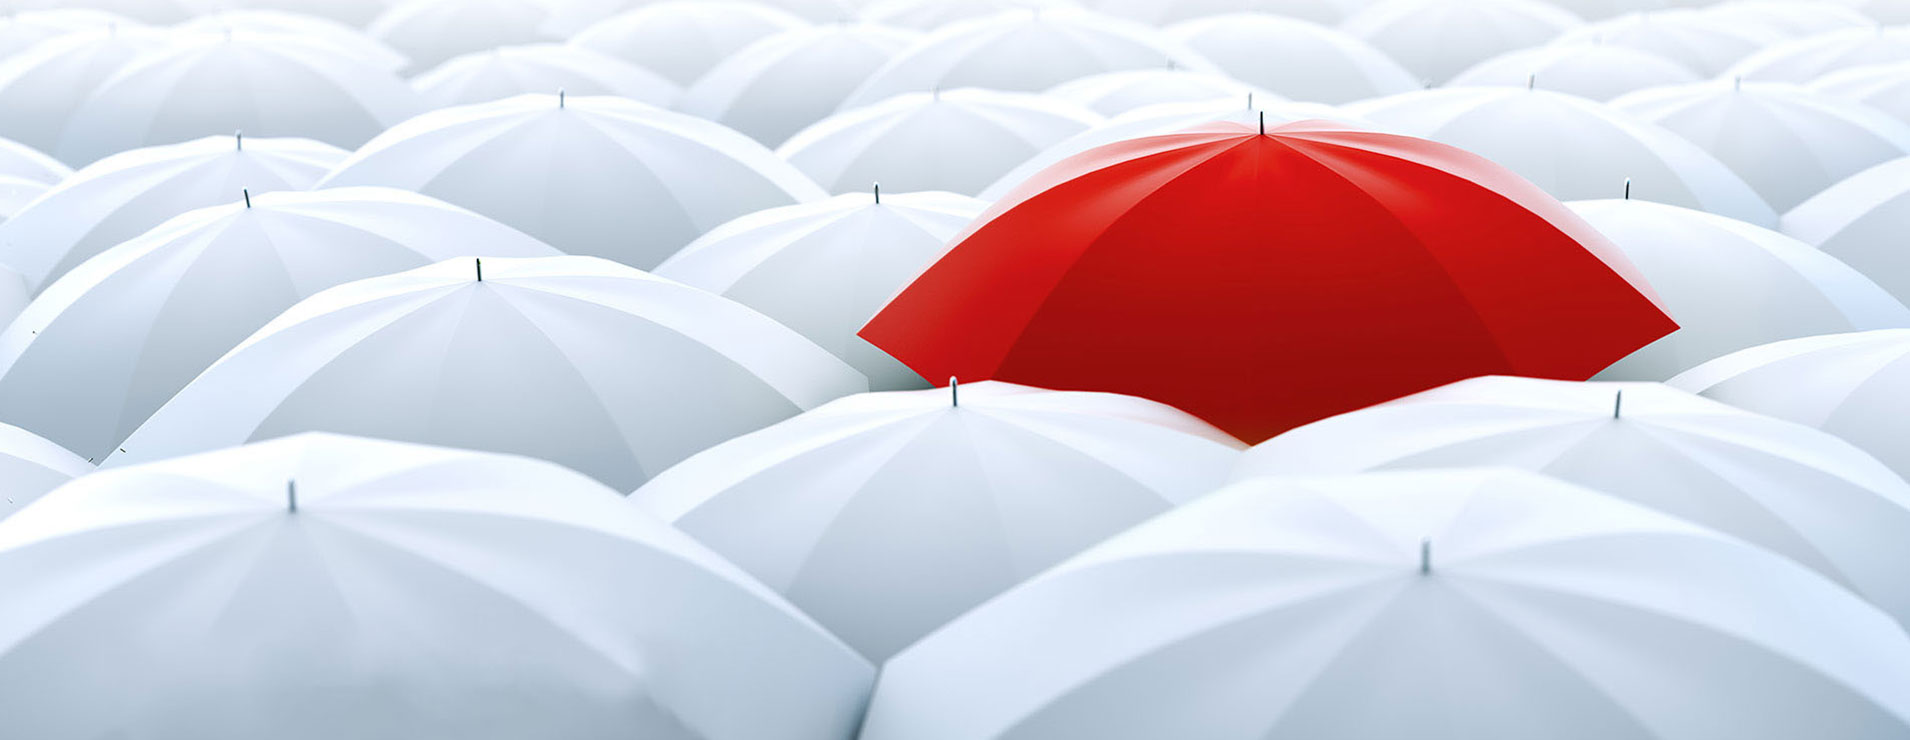 Banner Image of Red Umbrella among white umbrellas